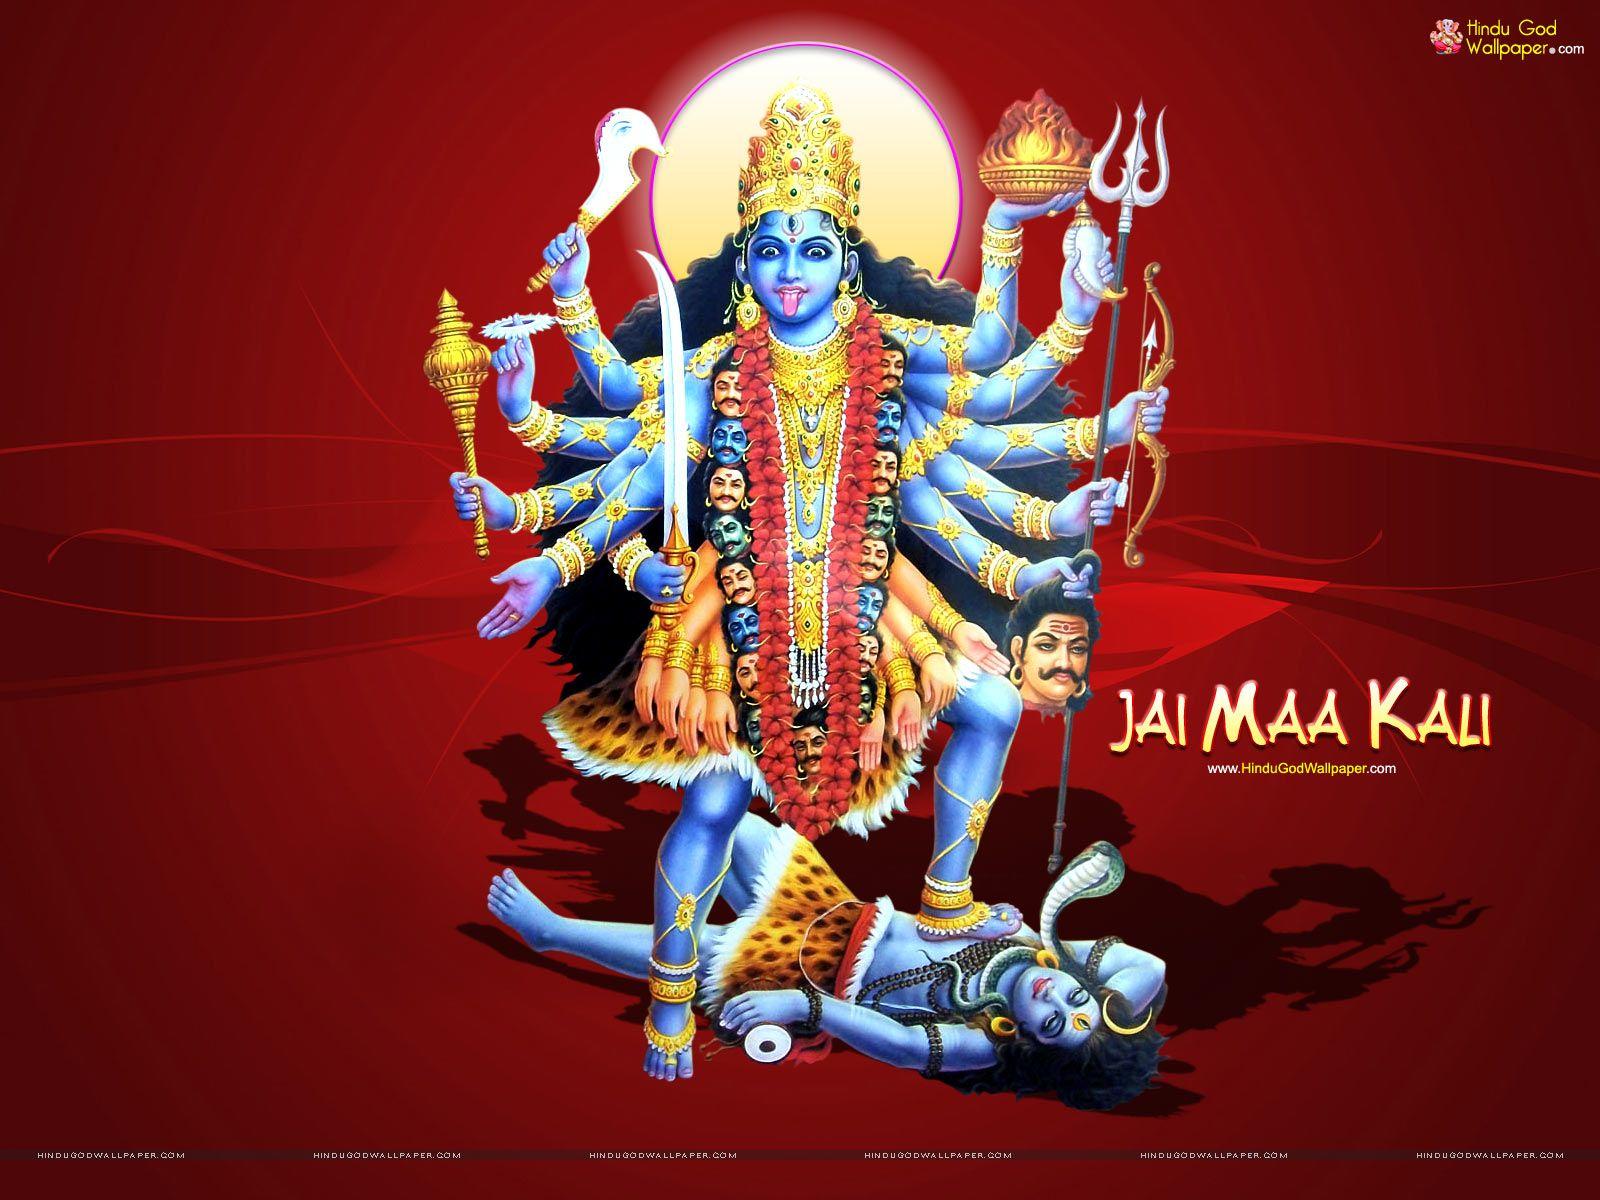 Jai Kali Kalkatte Wali Wallpaper Free Download Godness Shiva